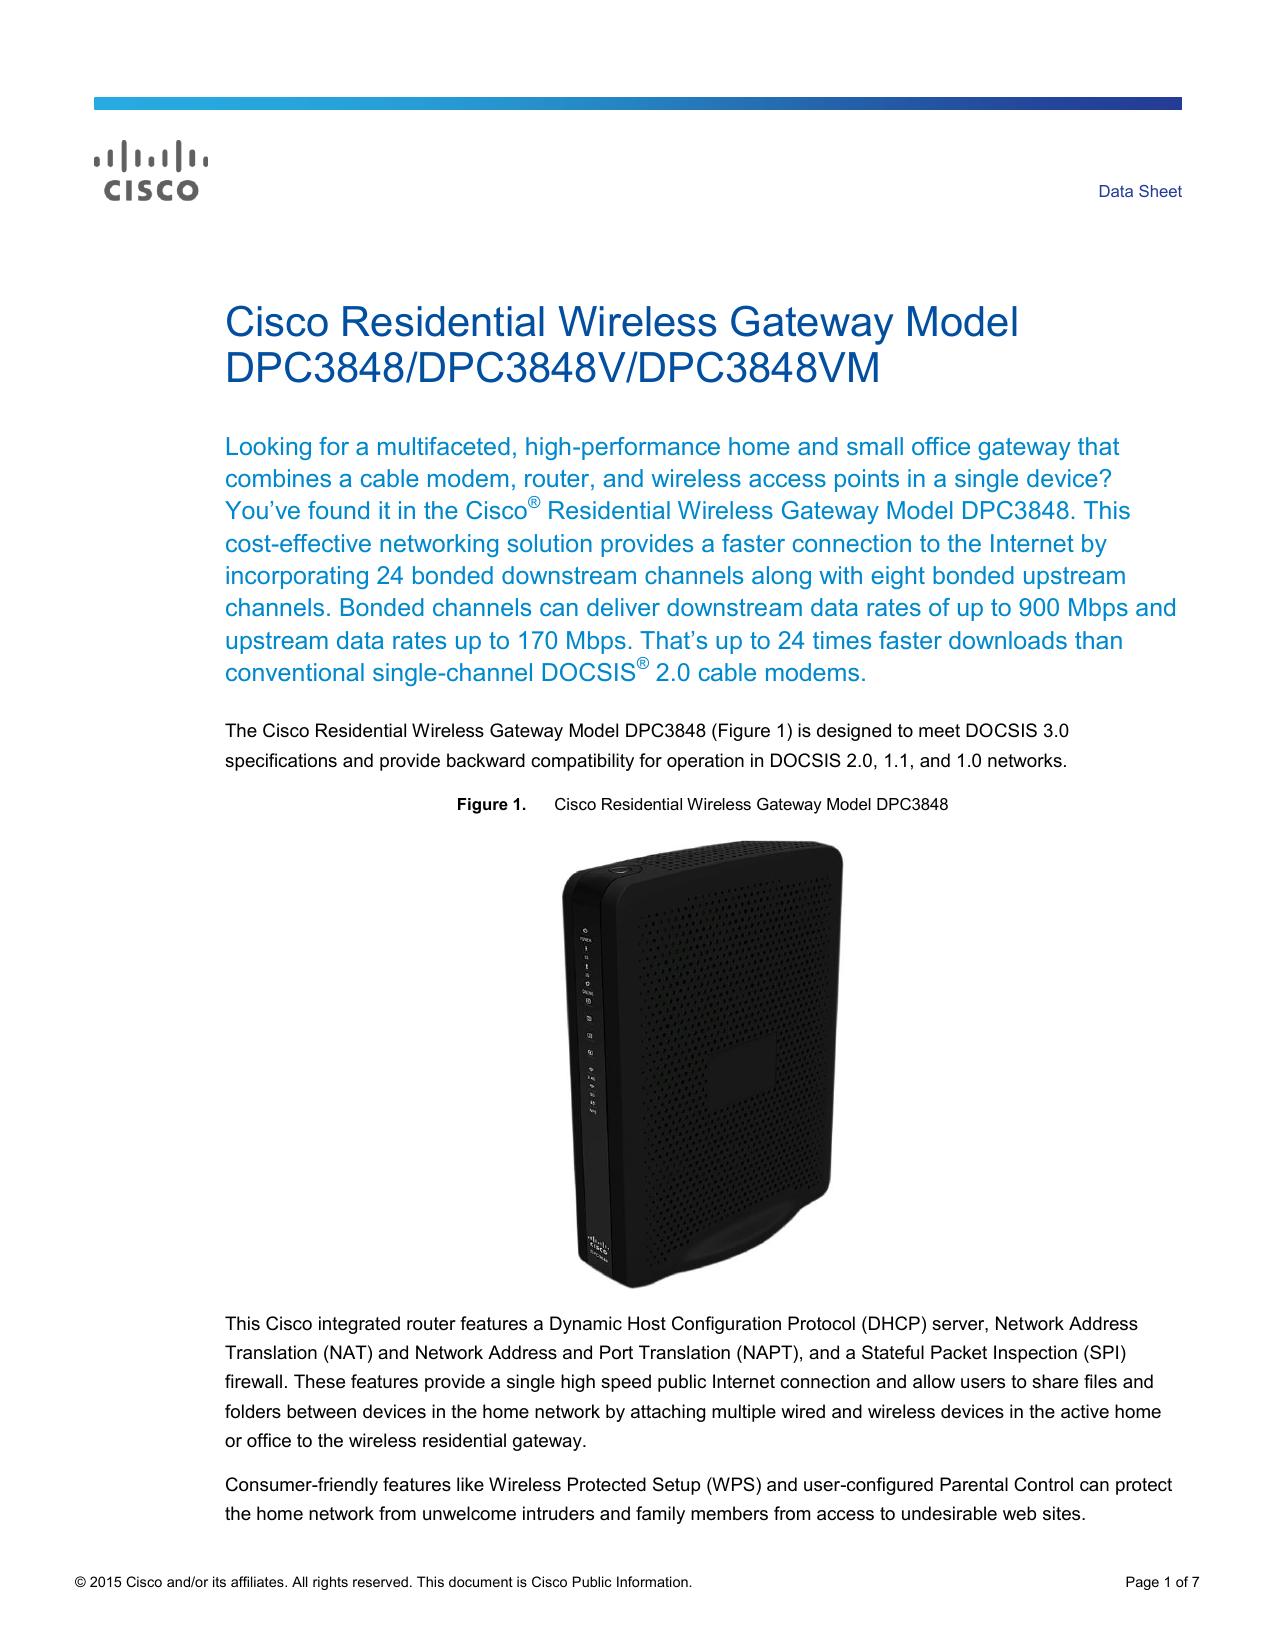 Technicolor DPC3941B DOCSIS 3.0 24x4 Wireless Business Gateway ...